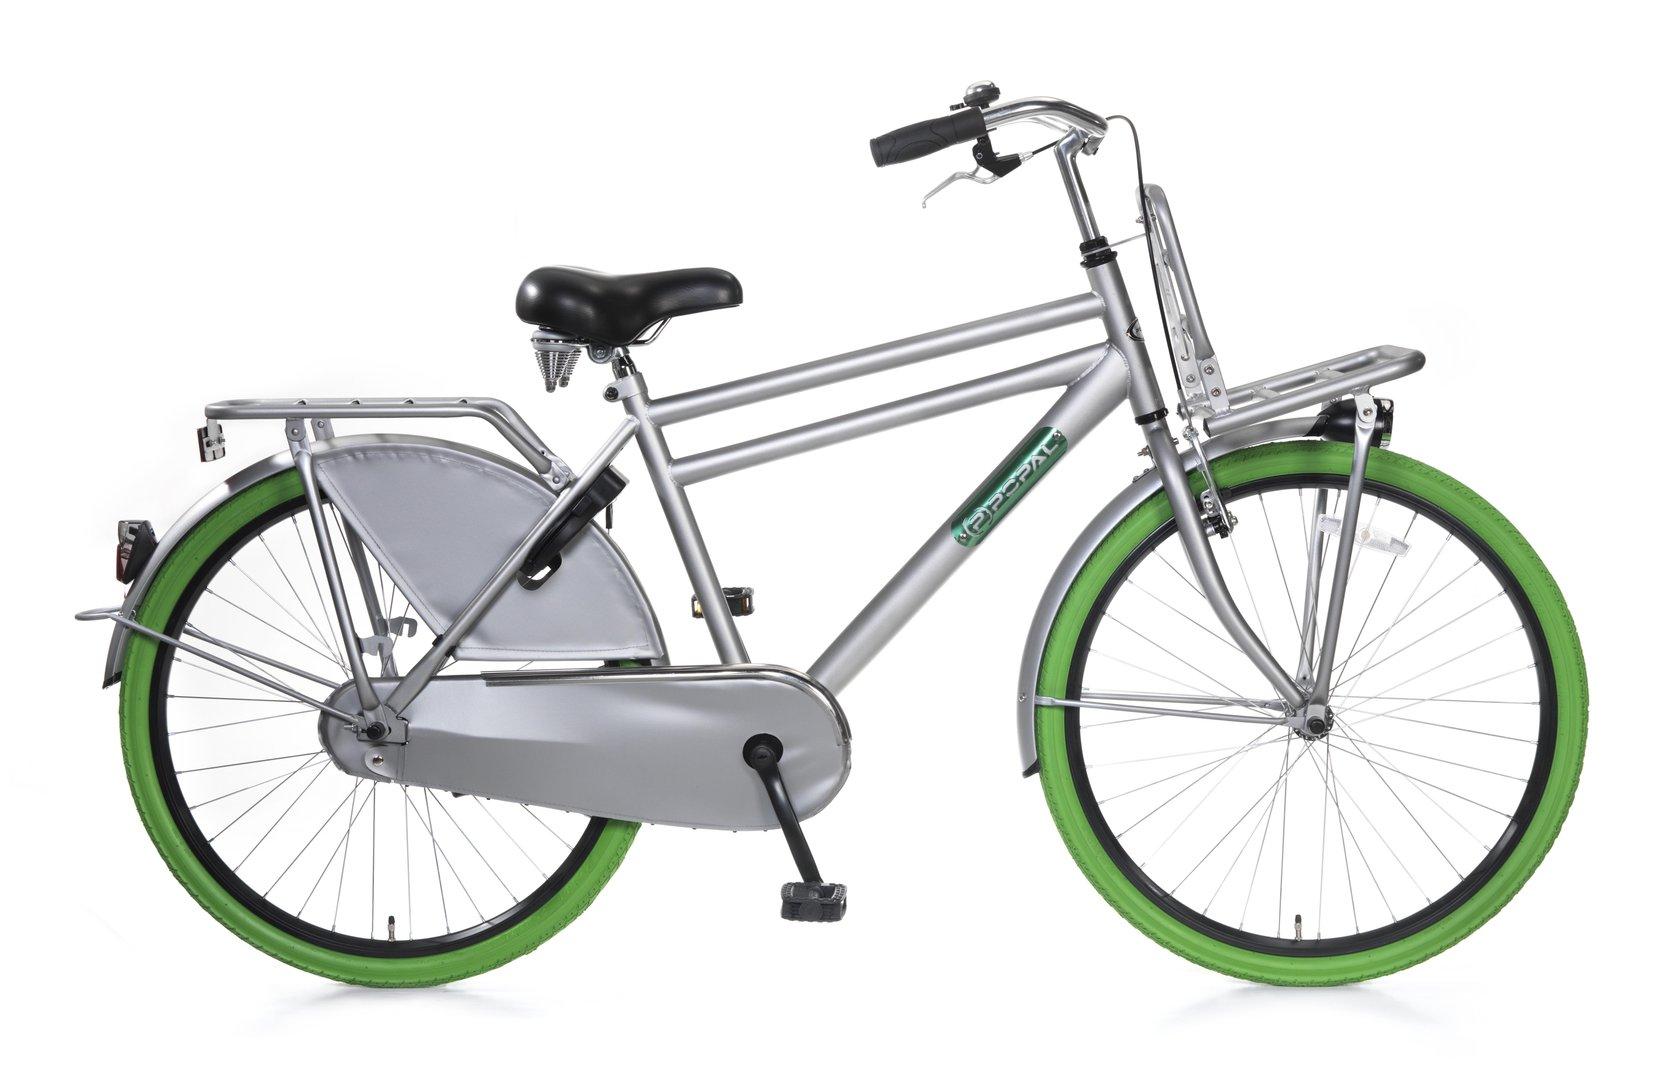 holland fahrrad schreiben muster. Black Bedroom Furniture Sets. Home Design Ideas